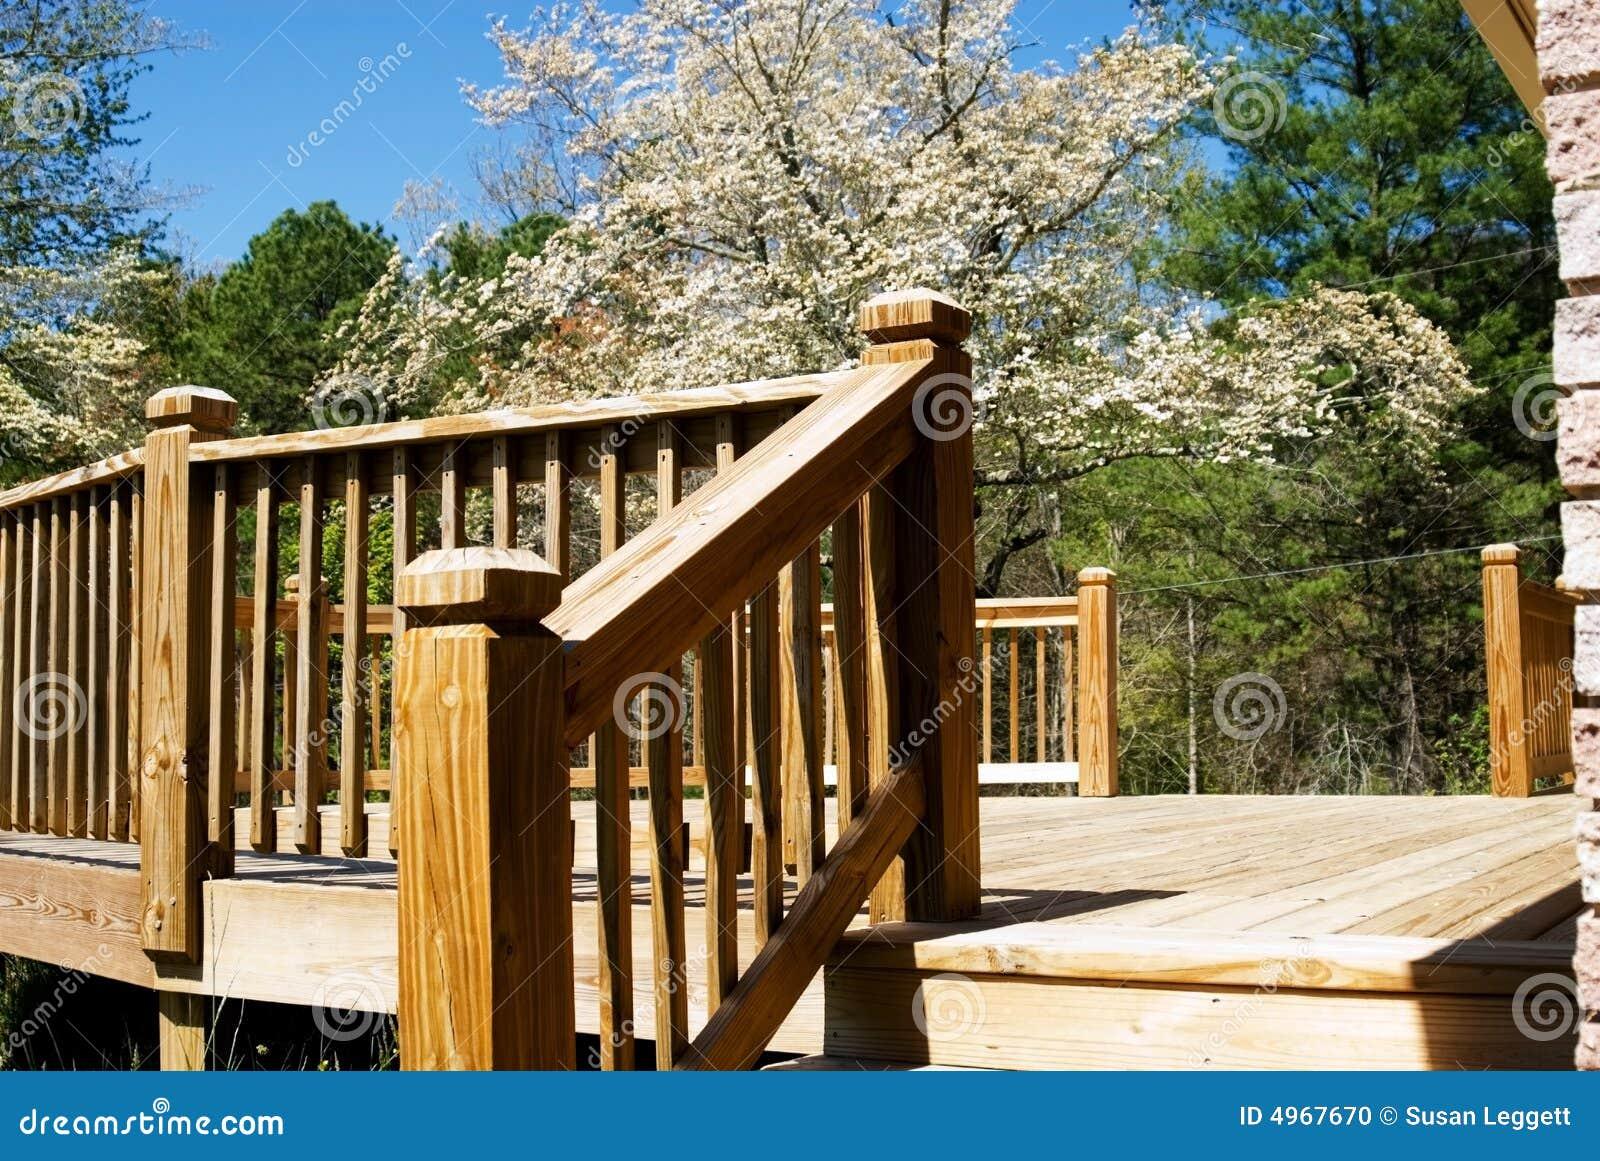 Plataforma de madeira na mola/etapas